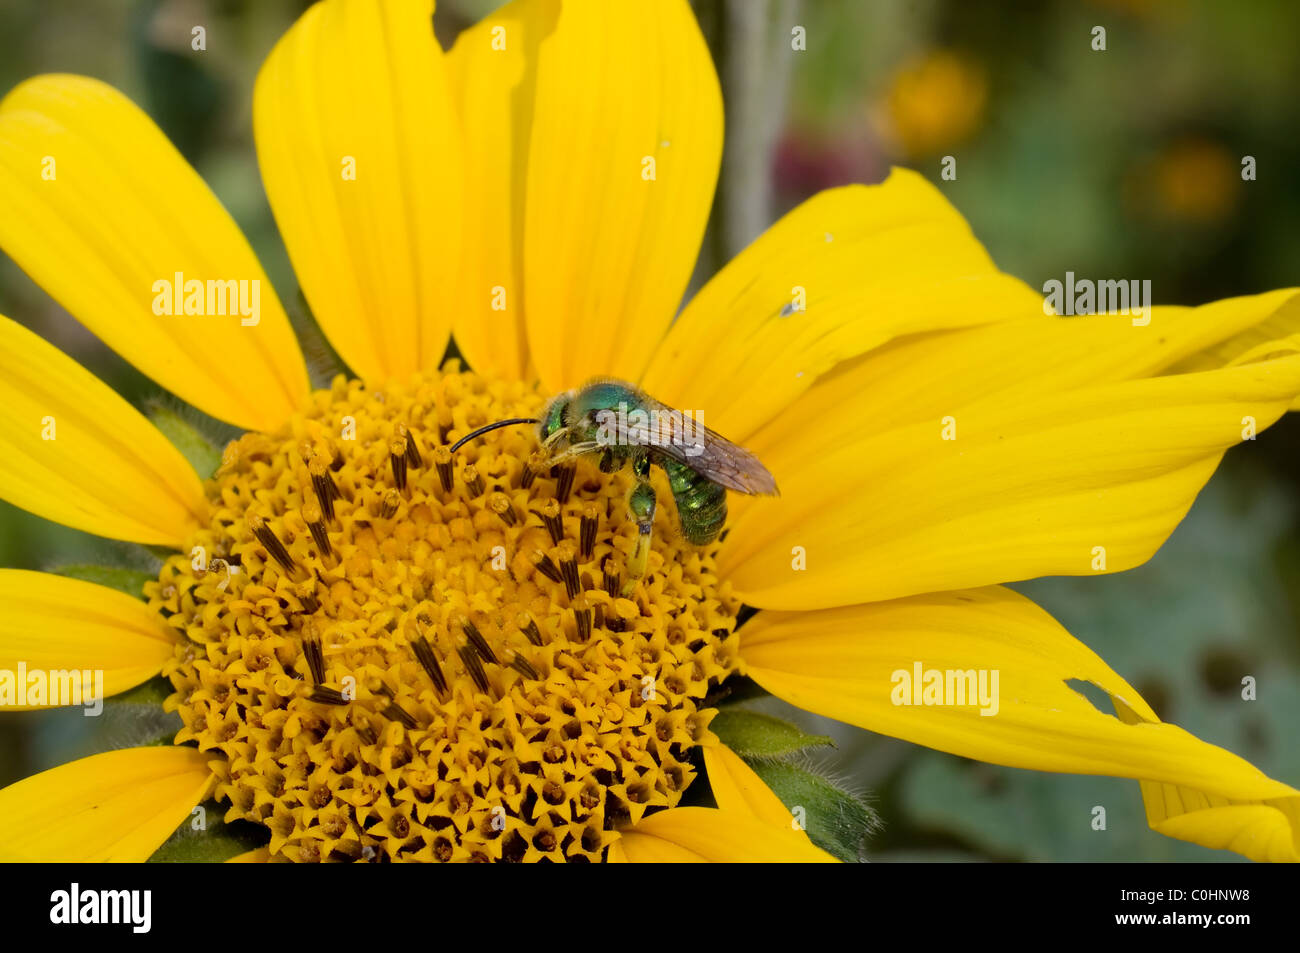 Sweat bee (Halictidae) feeding from a Mexican sunflower (Tithonia tubaeformis) - Stock Image